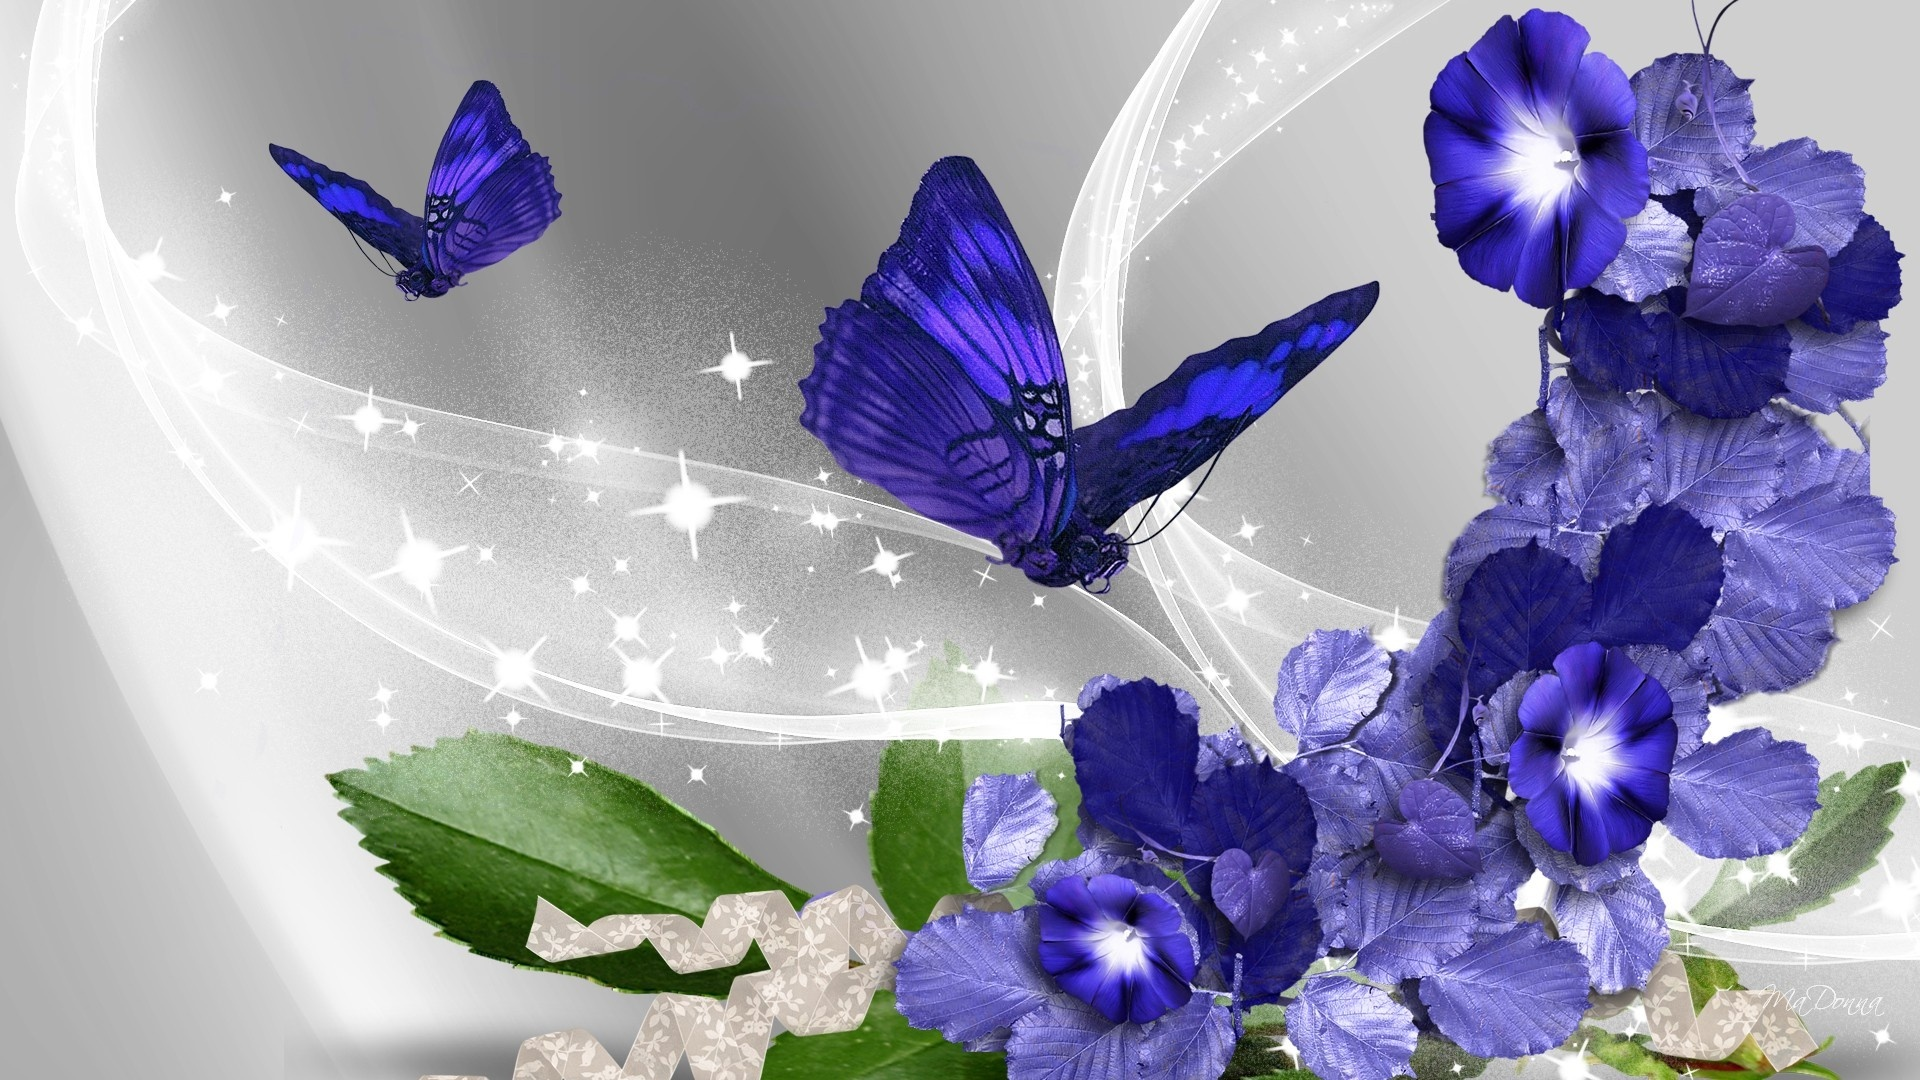 Flower HD Wallpaper Background Image 1920x1080 ID301803 1920x1080